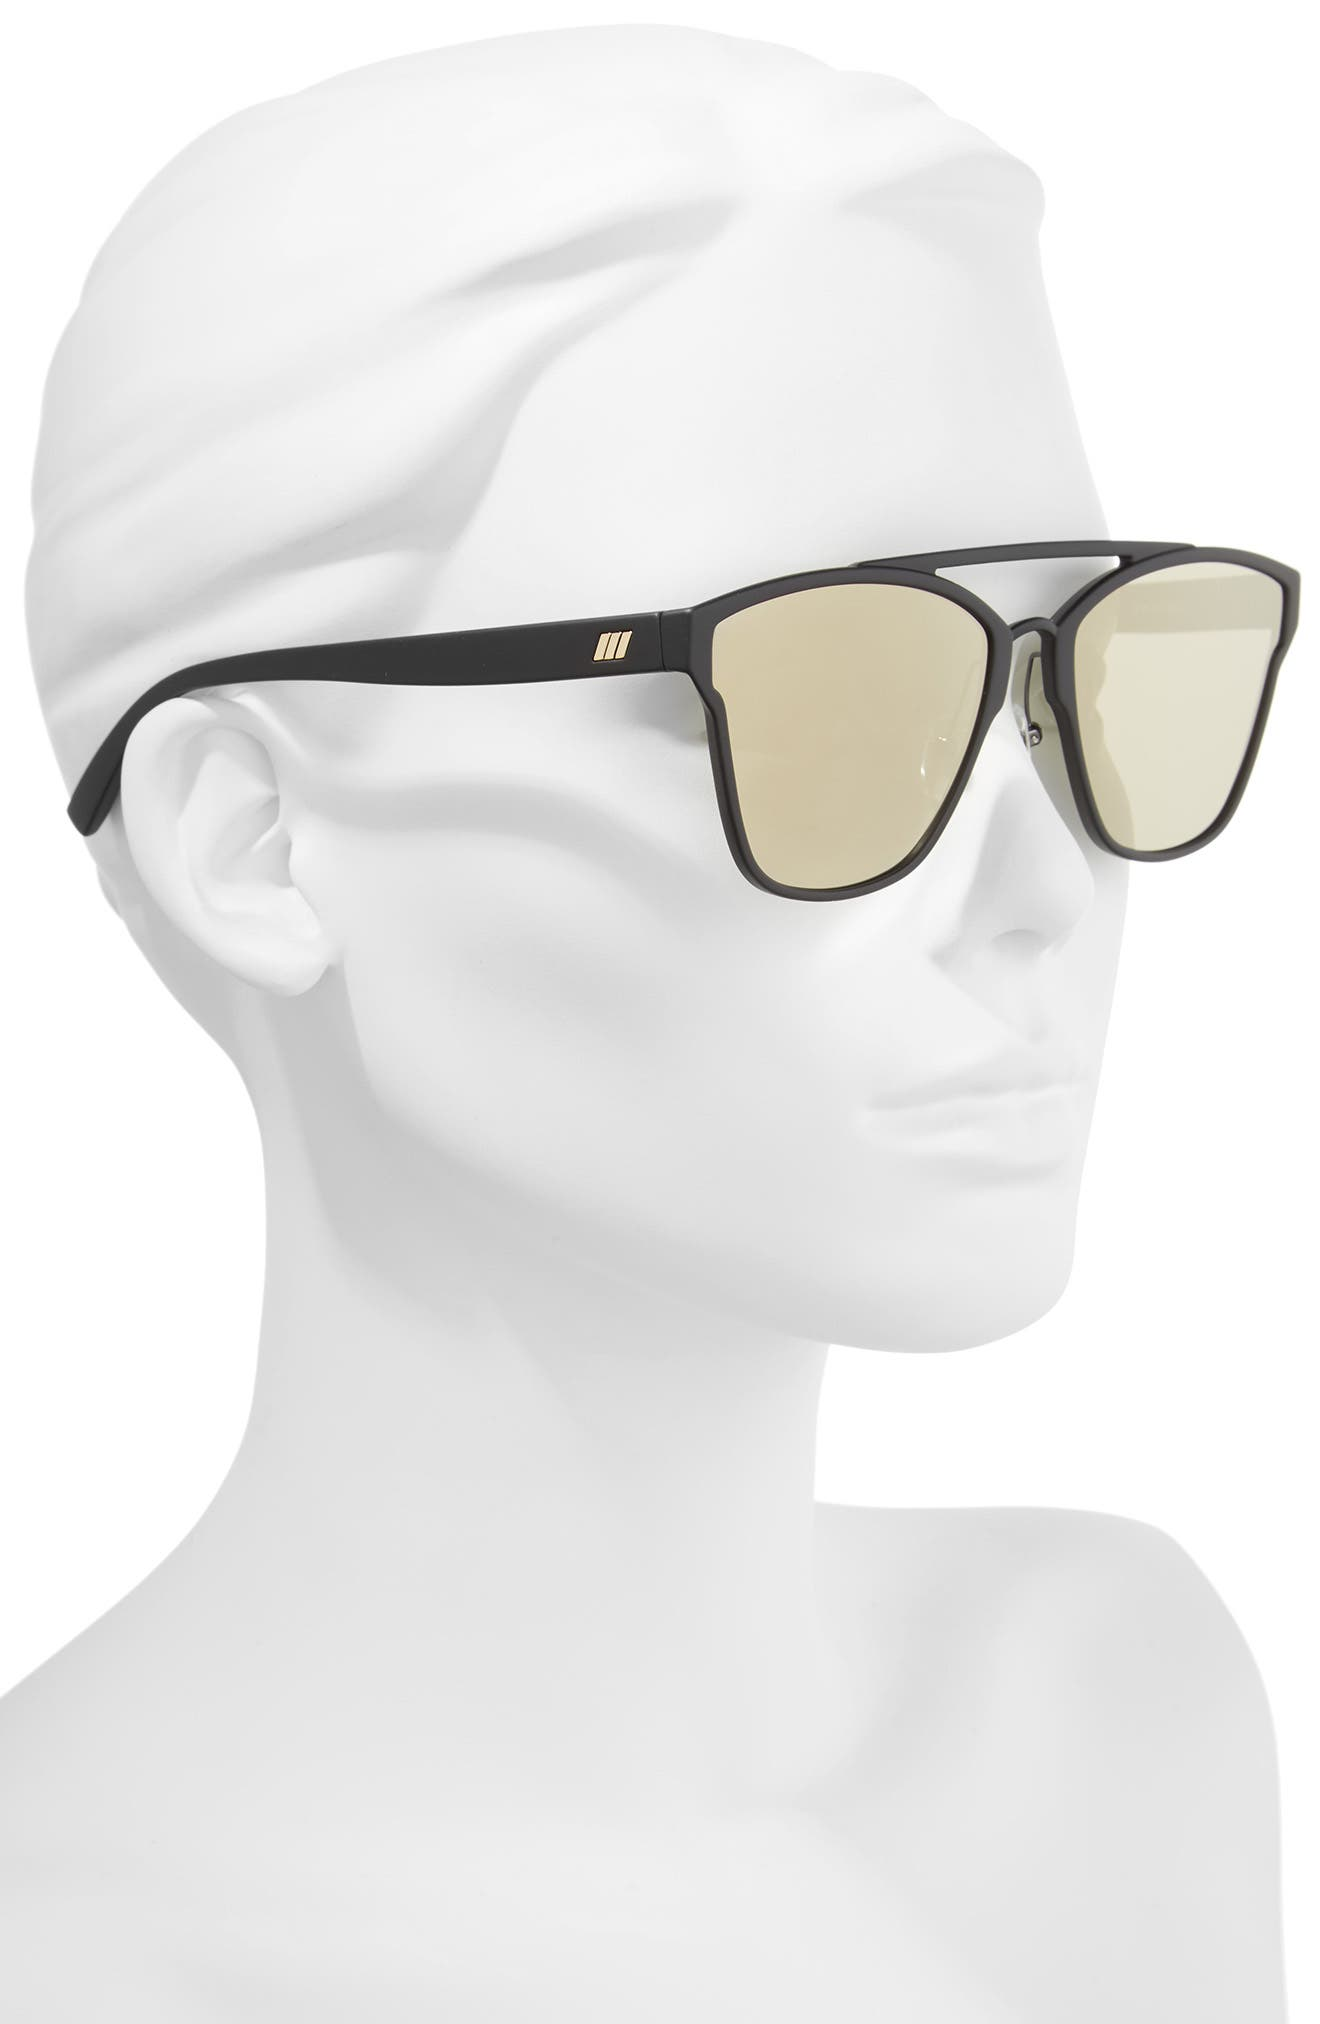 Herstory 55mm Aviator Sunglasses,                             Alternate thumbnail 2, color,                             001